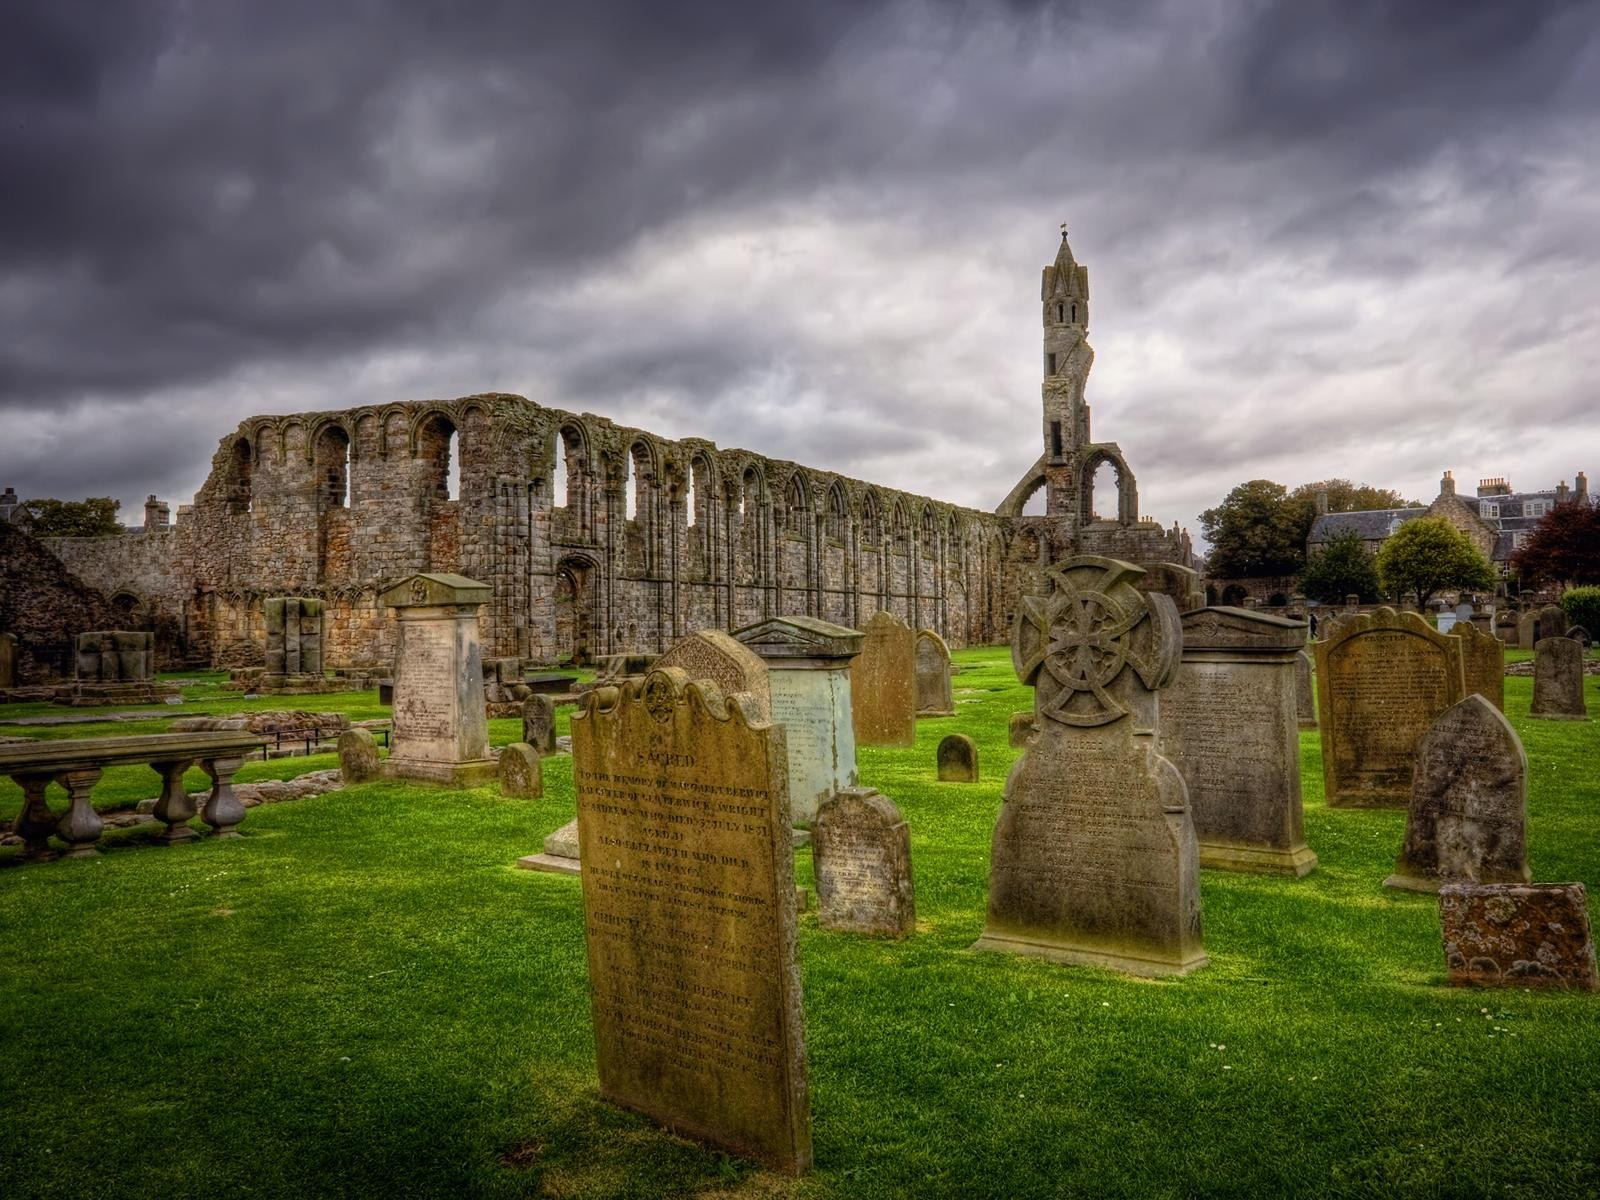 Fall Graveyard Cemetery Wallpaper Scotland Ancient Celtic Wallpaper 1600x1200 199667